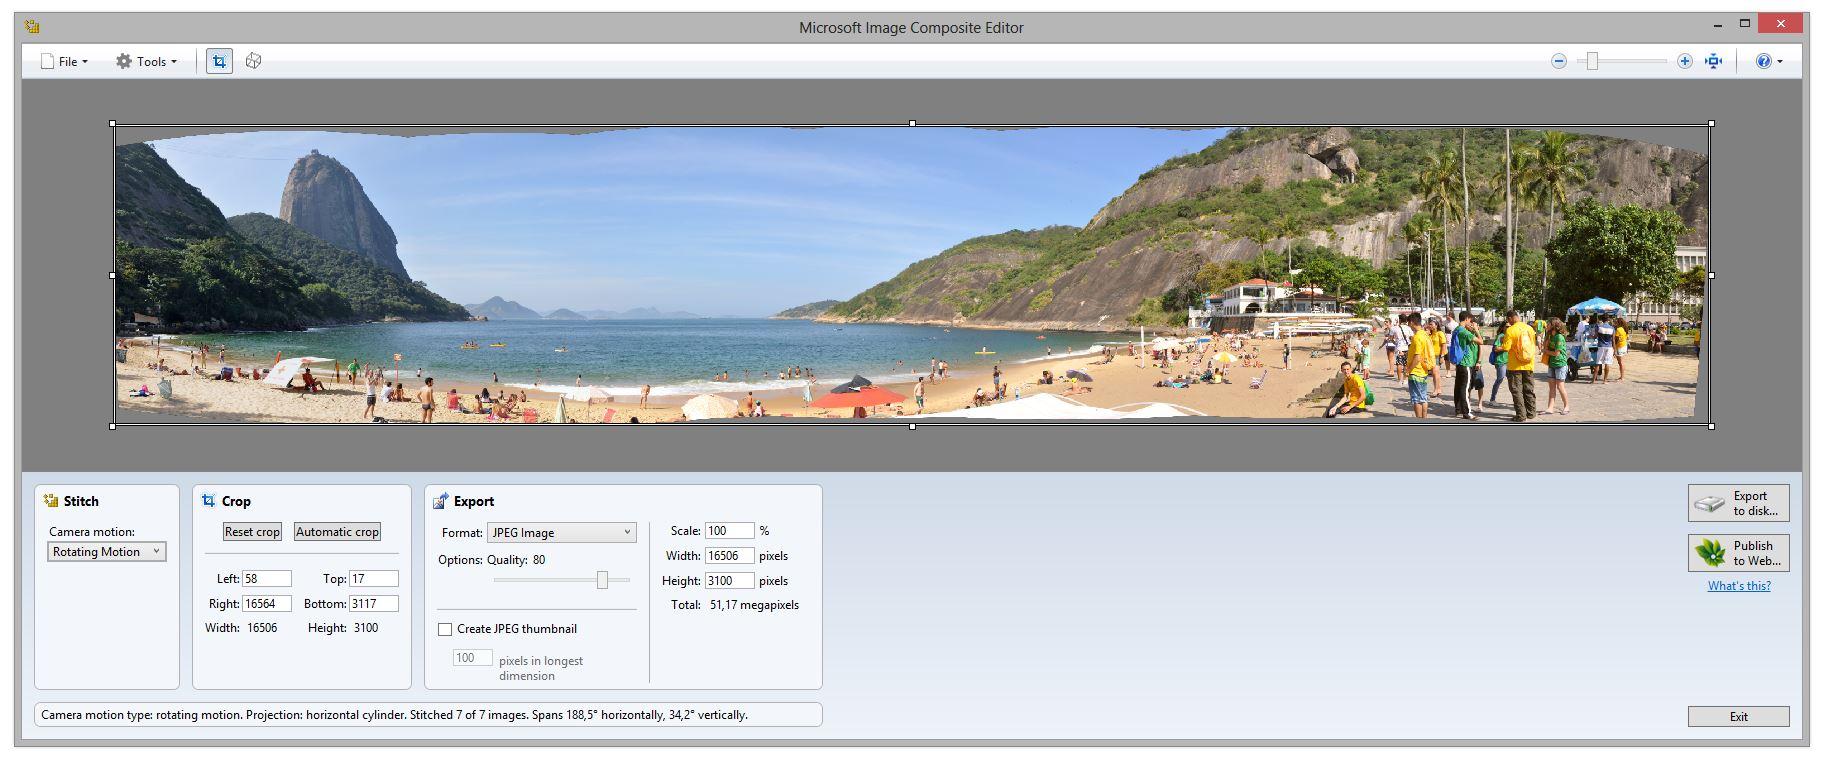 microsoft_image_composite_editor_-_webchronique